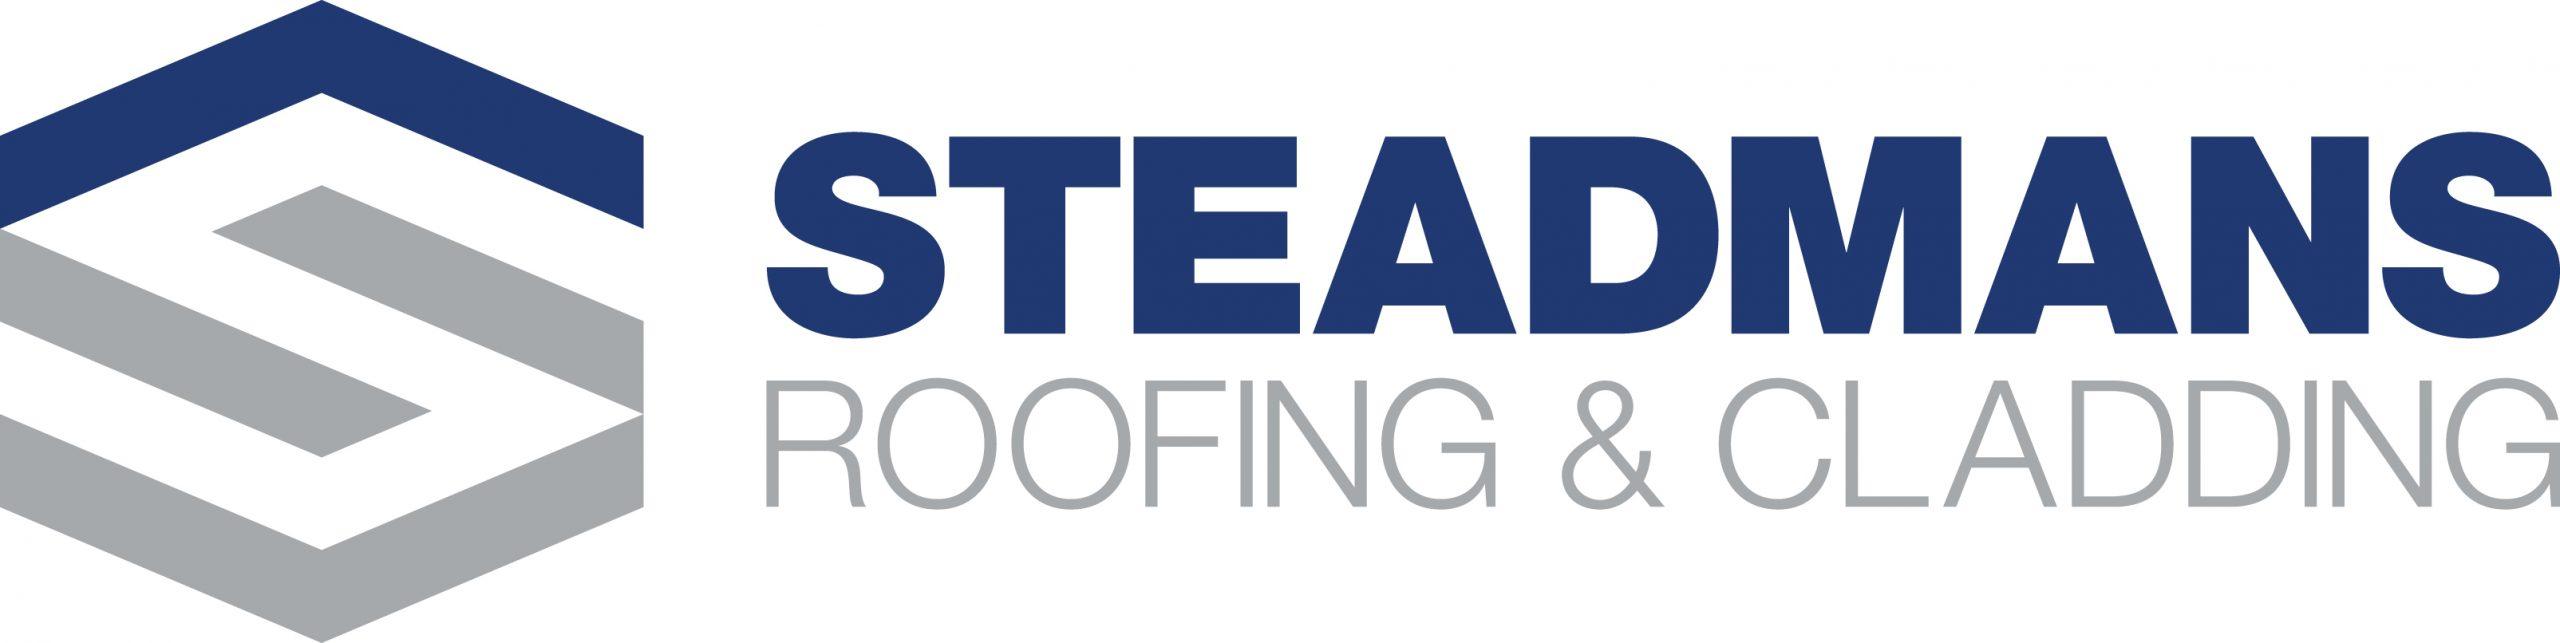 Steadmans logo